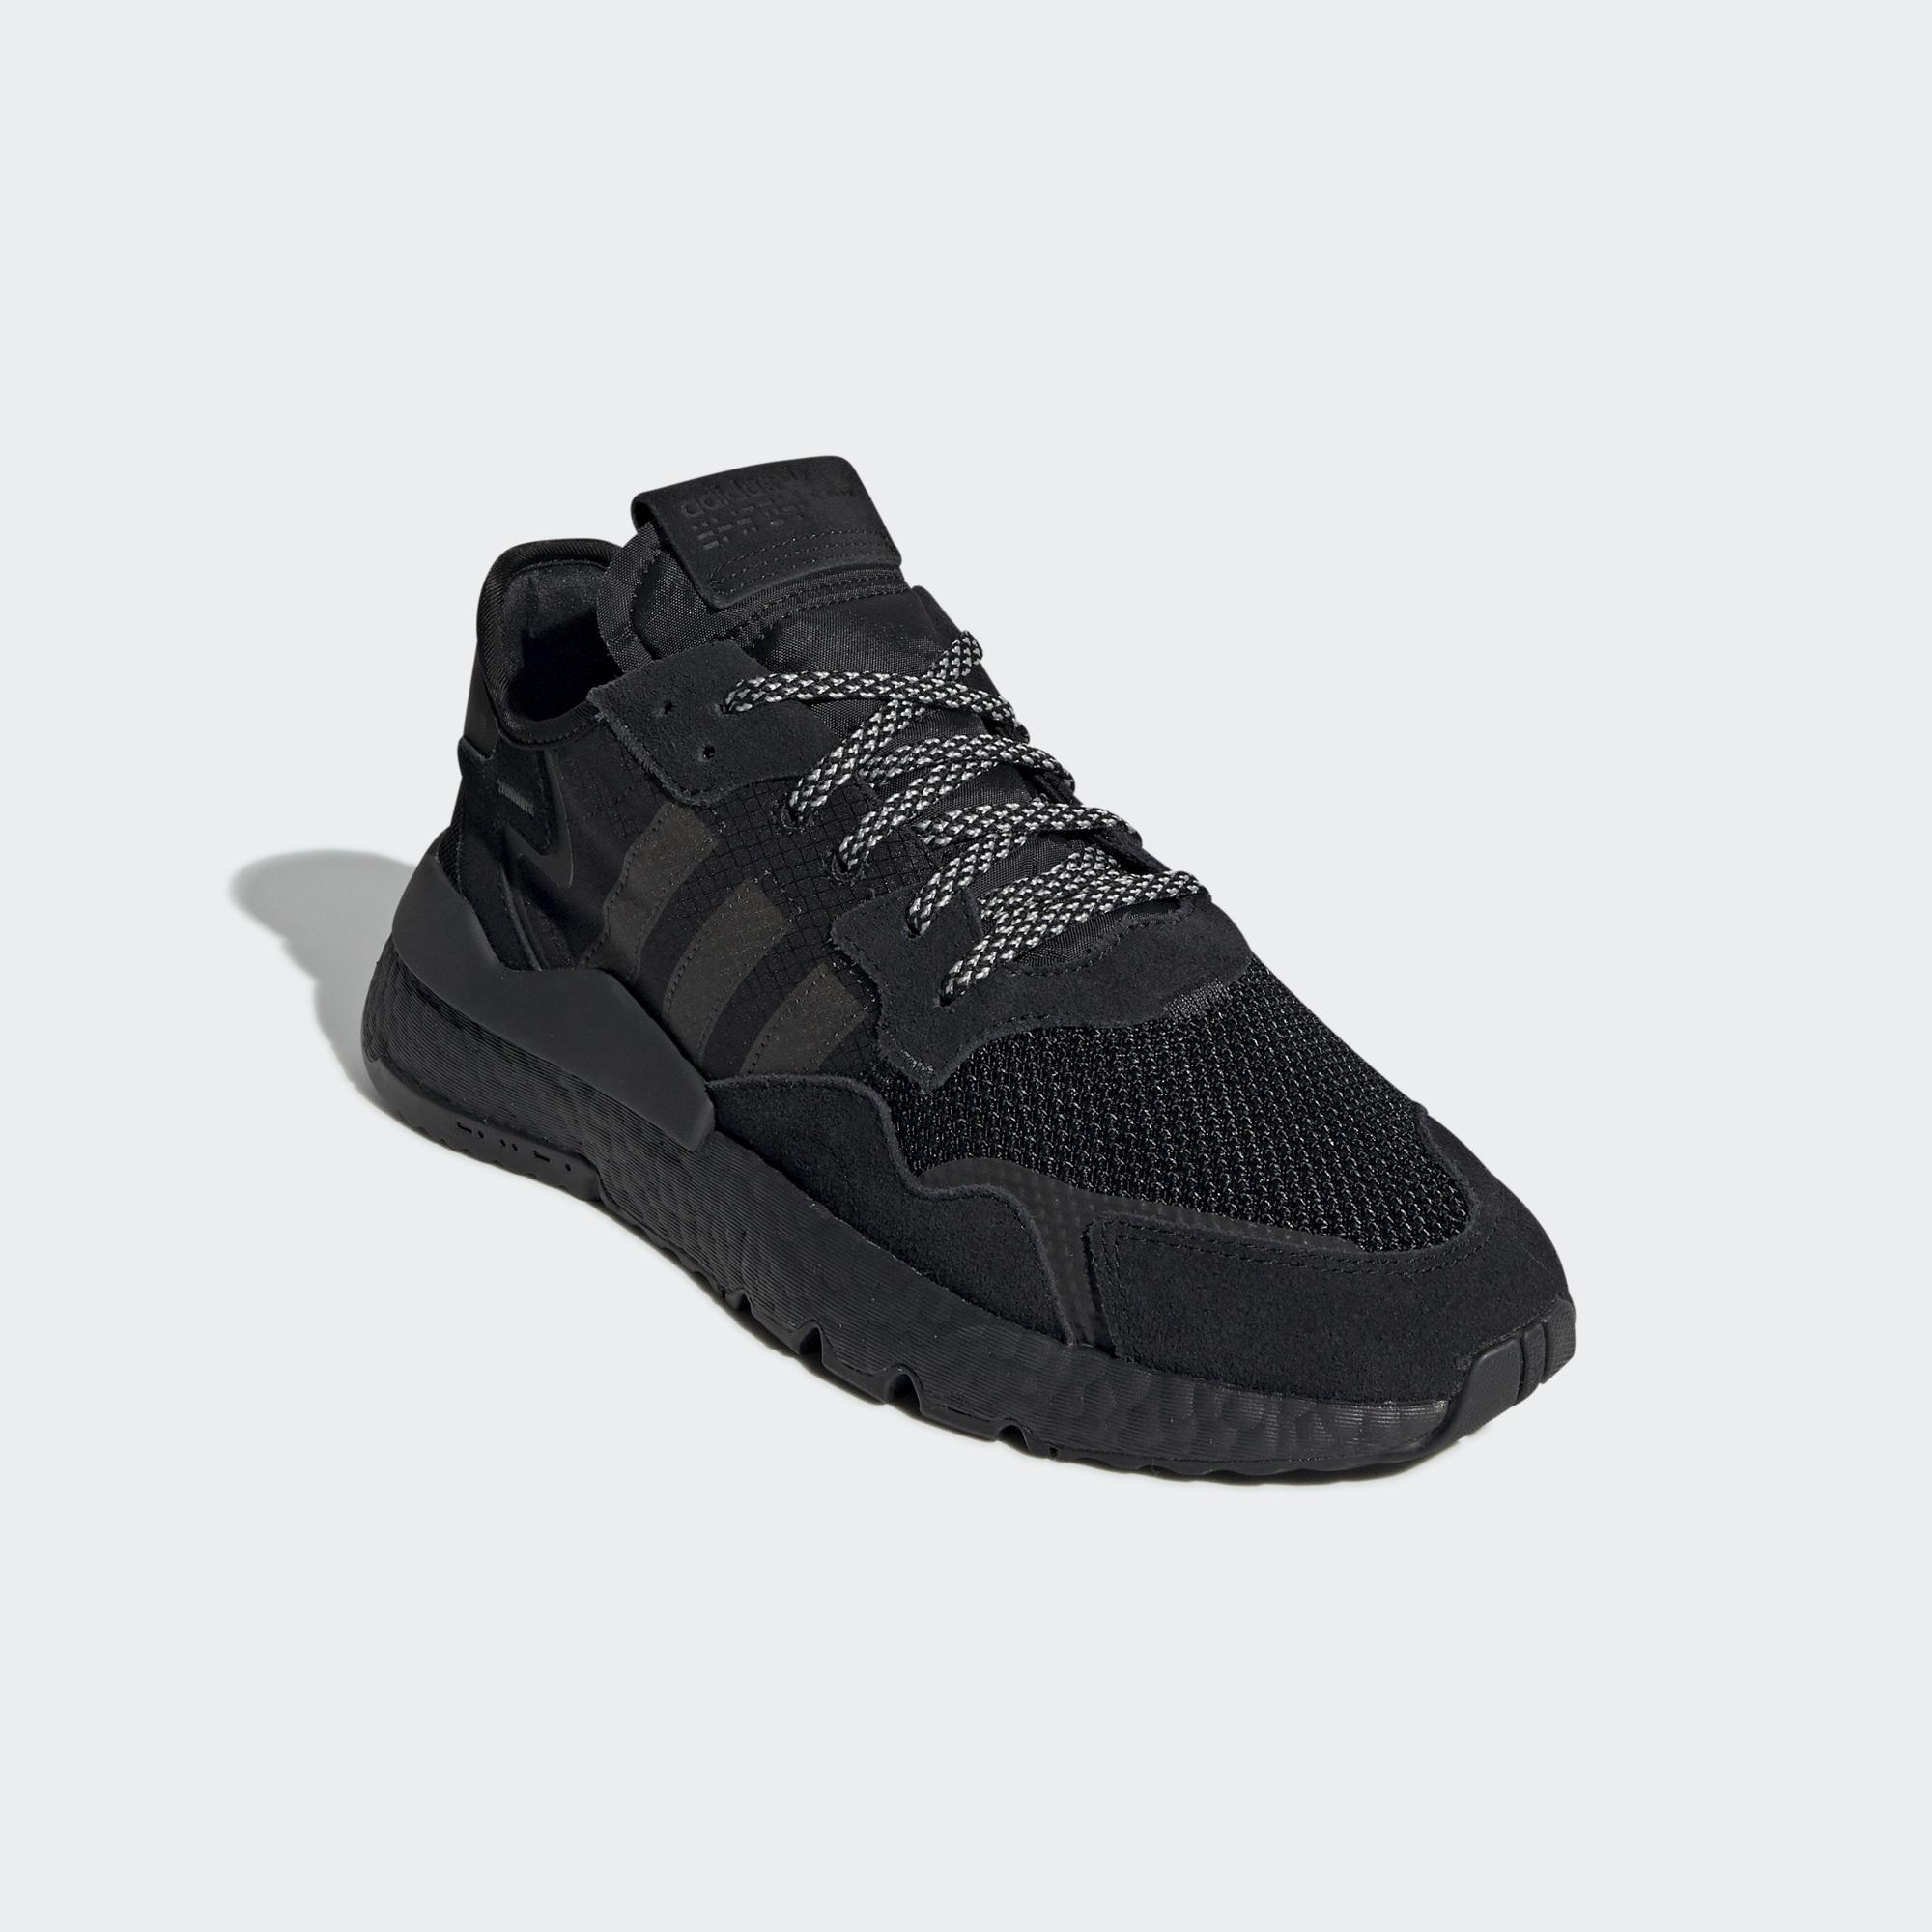 【ADIDAS】 NITE JOGGER 休閒鞋 慢跑鞋 男 訂價5290 BD7954 (Palace store) 2